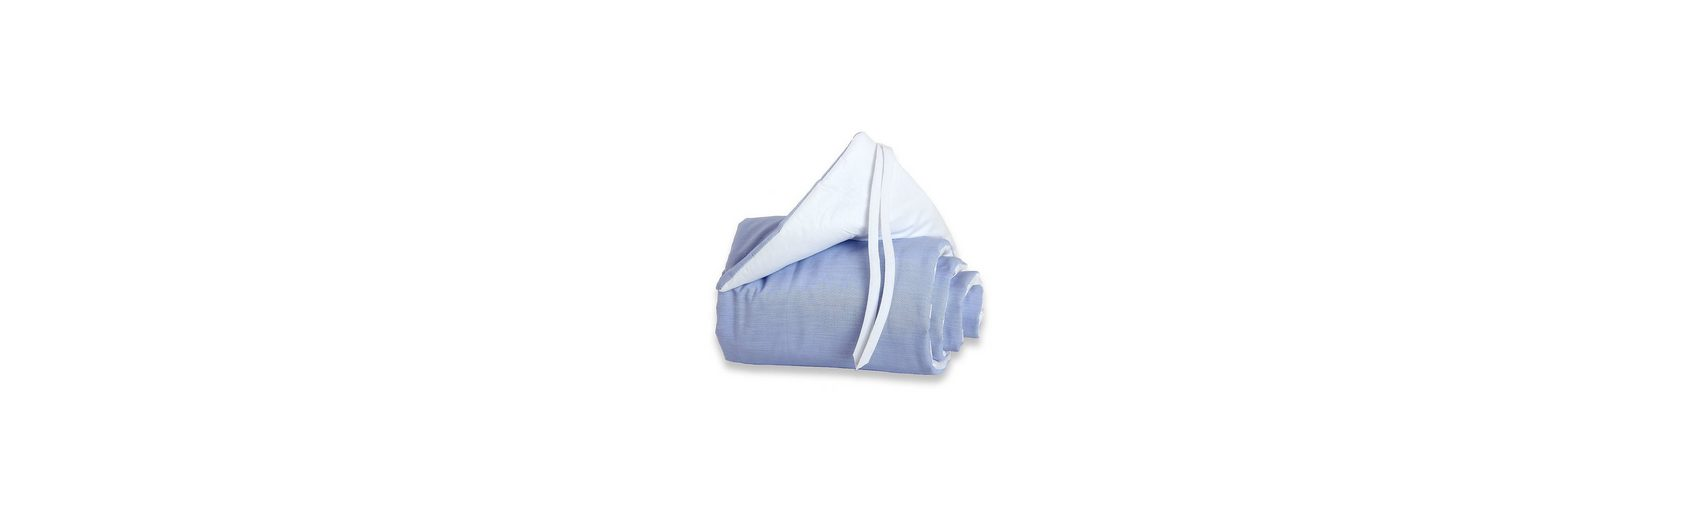 Tobi Nestchen für babybay mini/midi, blau, 157 x 25 cm